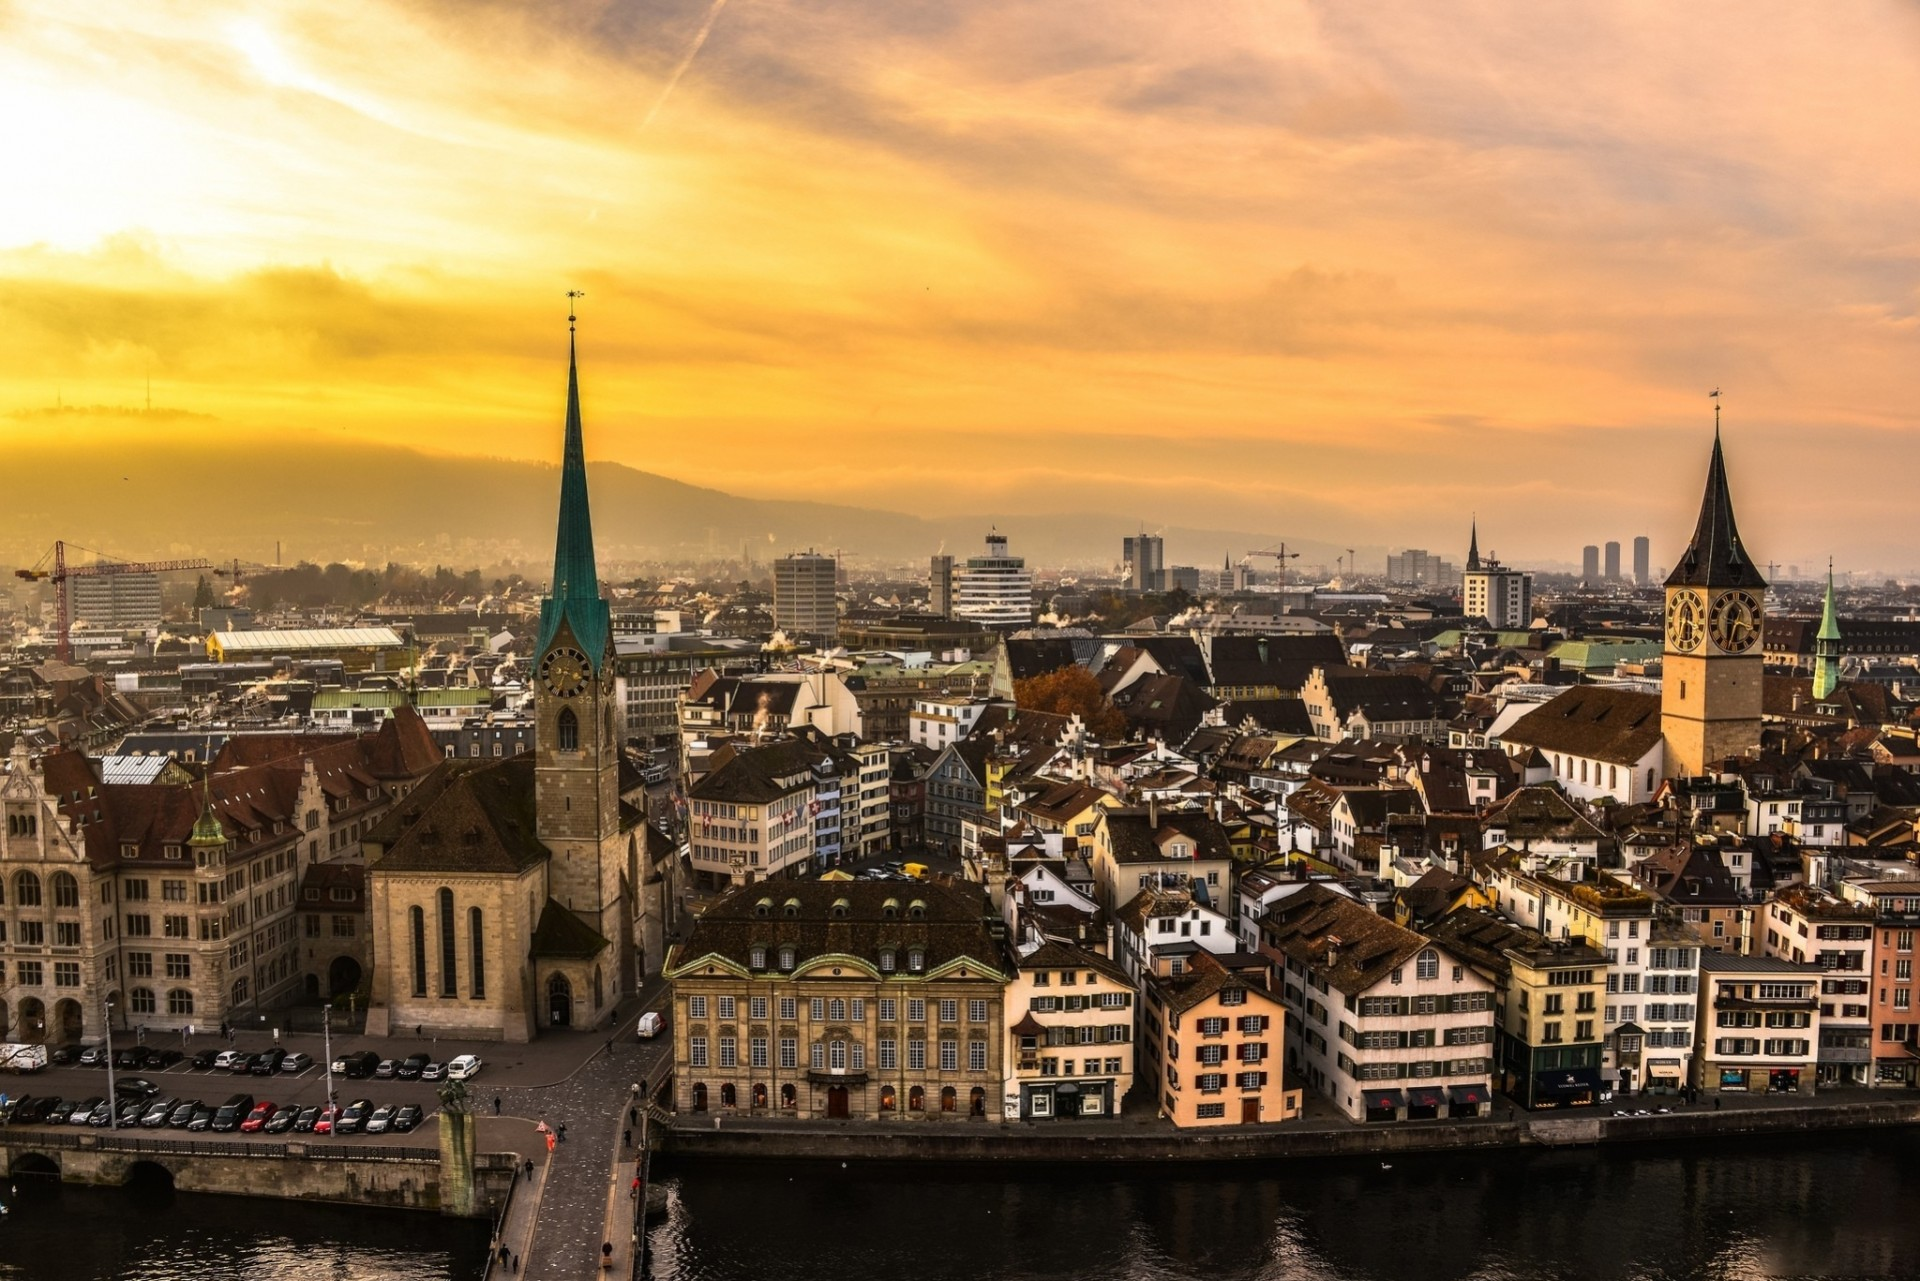 Синаногу в Цюрихе изуродовали антисемитскими граффити